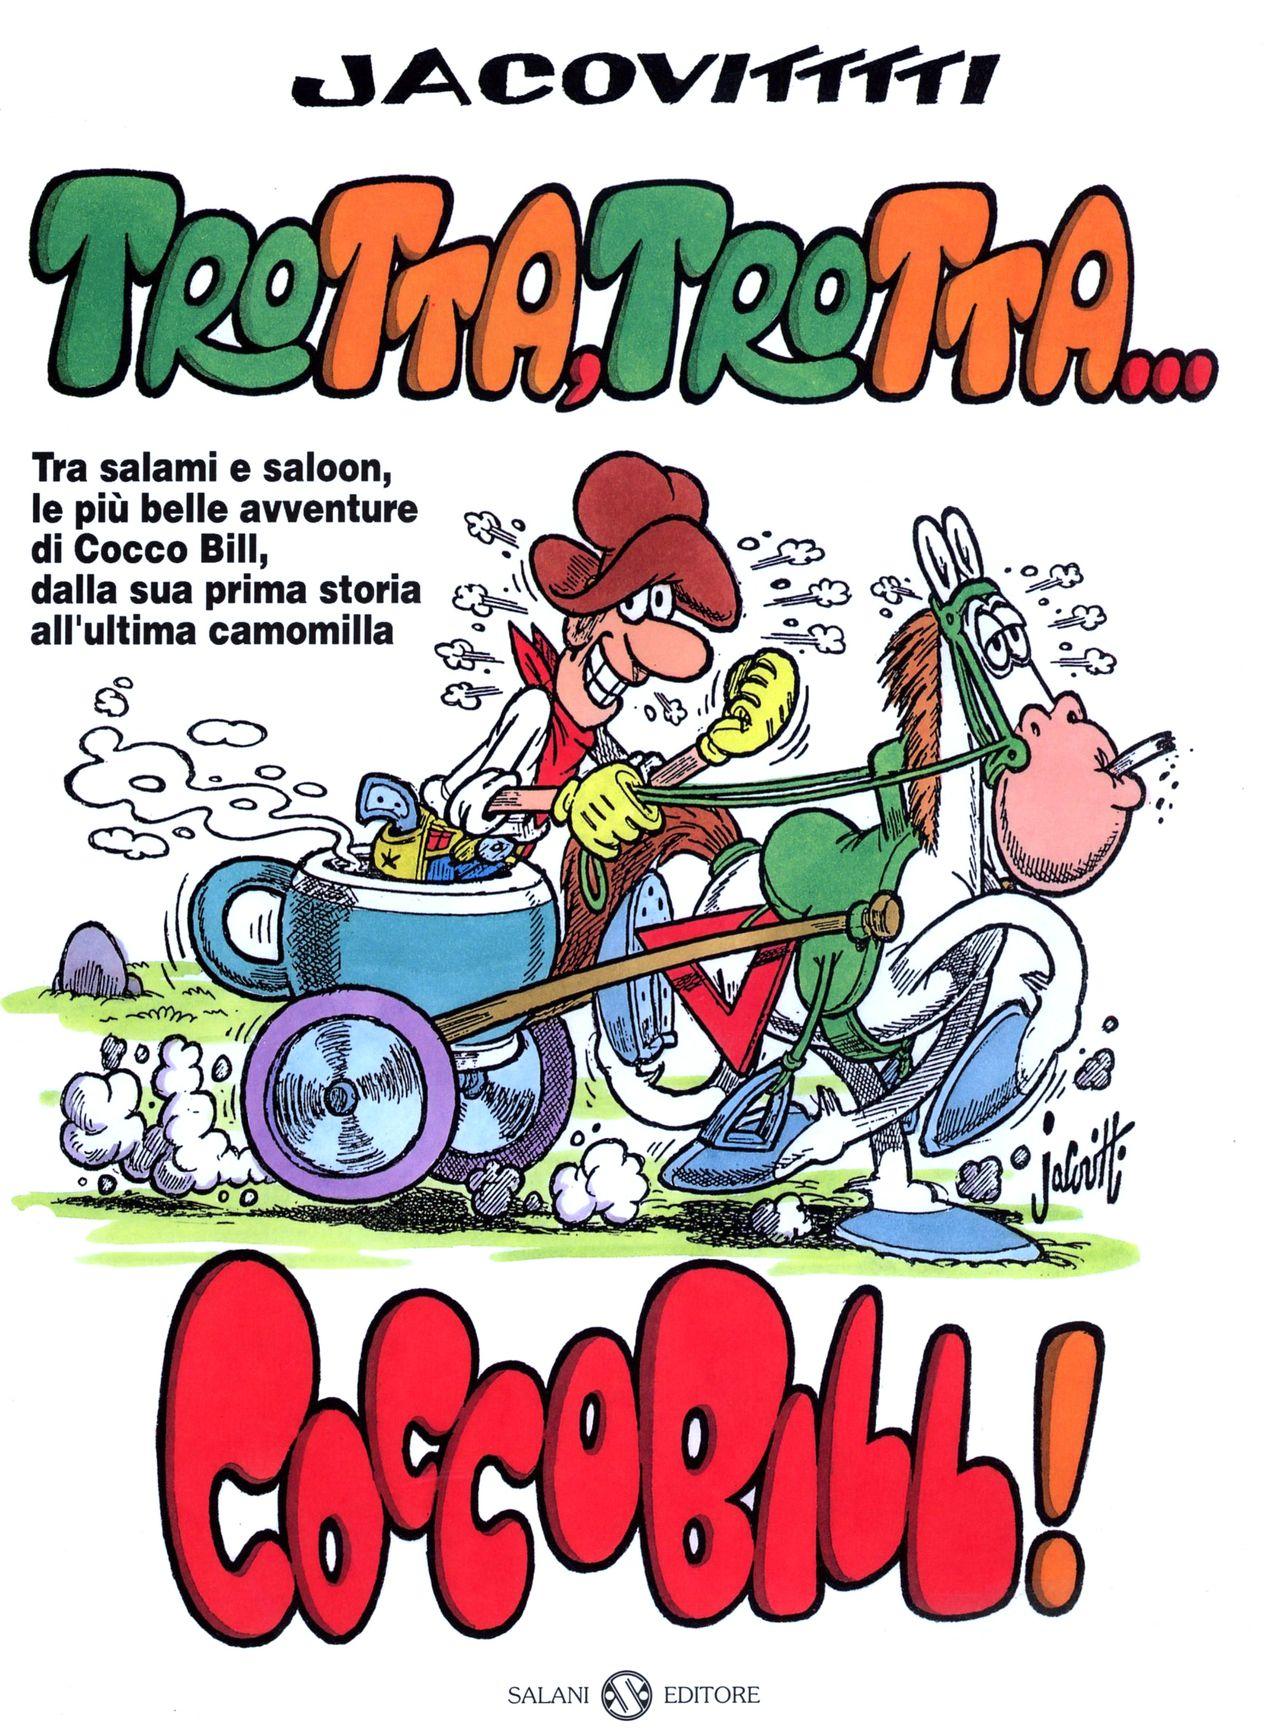 Trotta, Trotta... Cocco Bill! (1998)